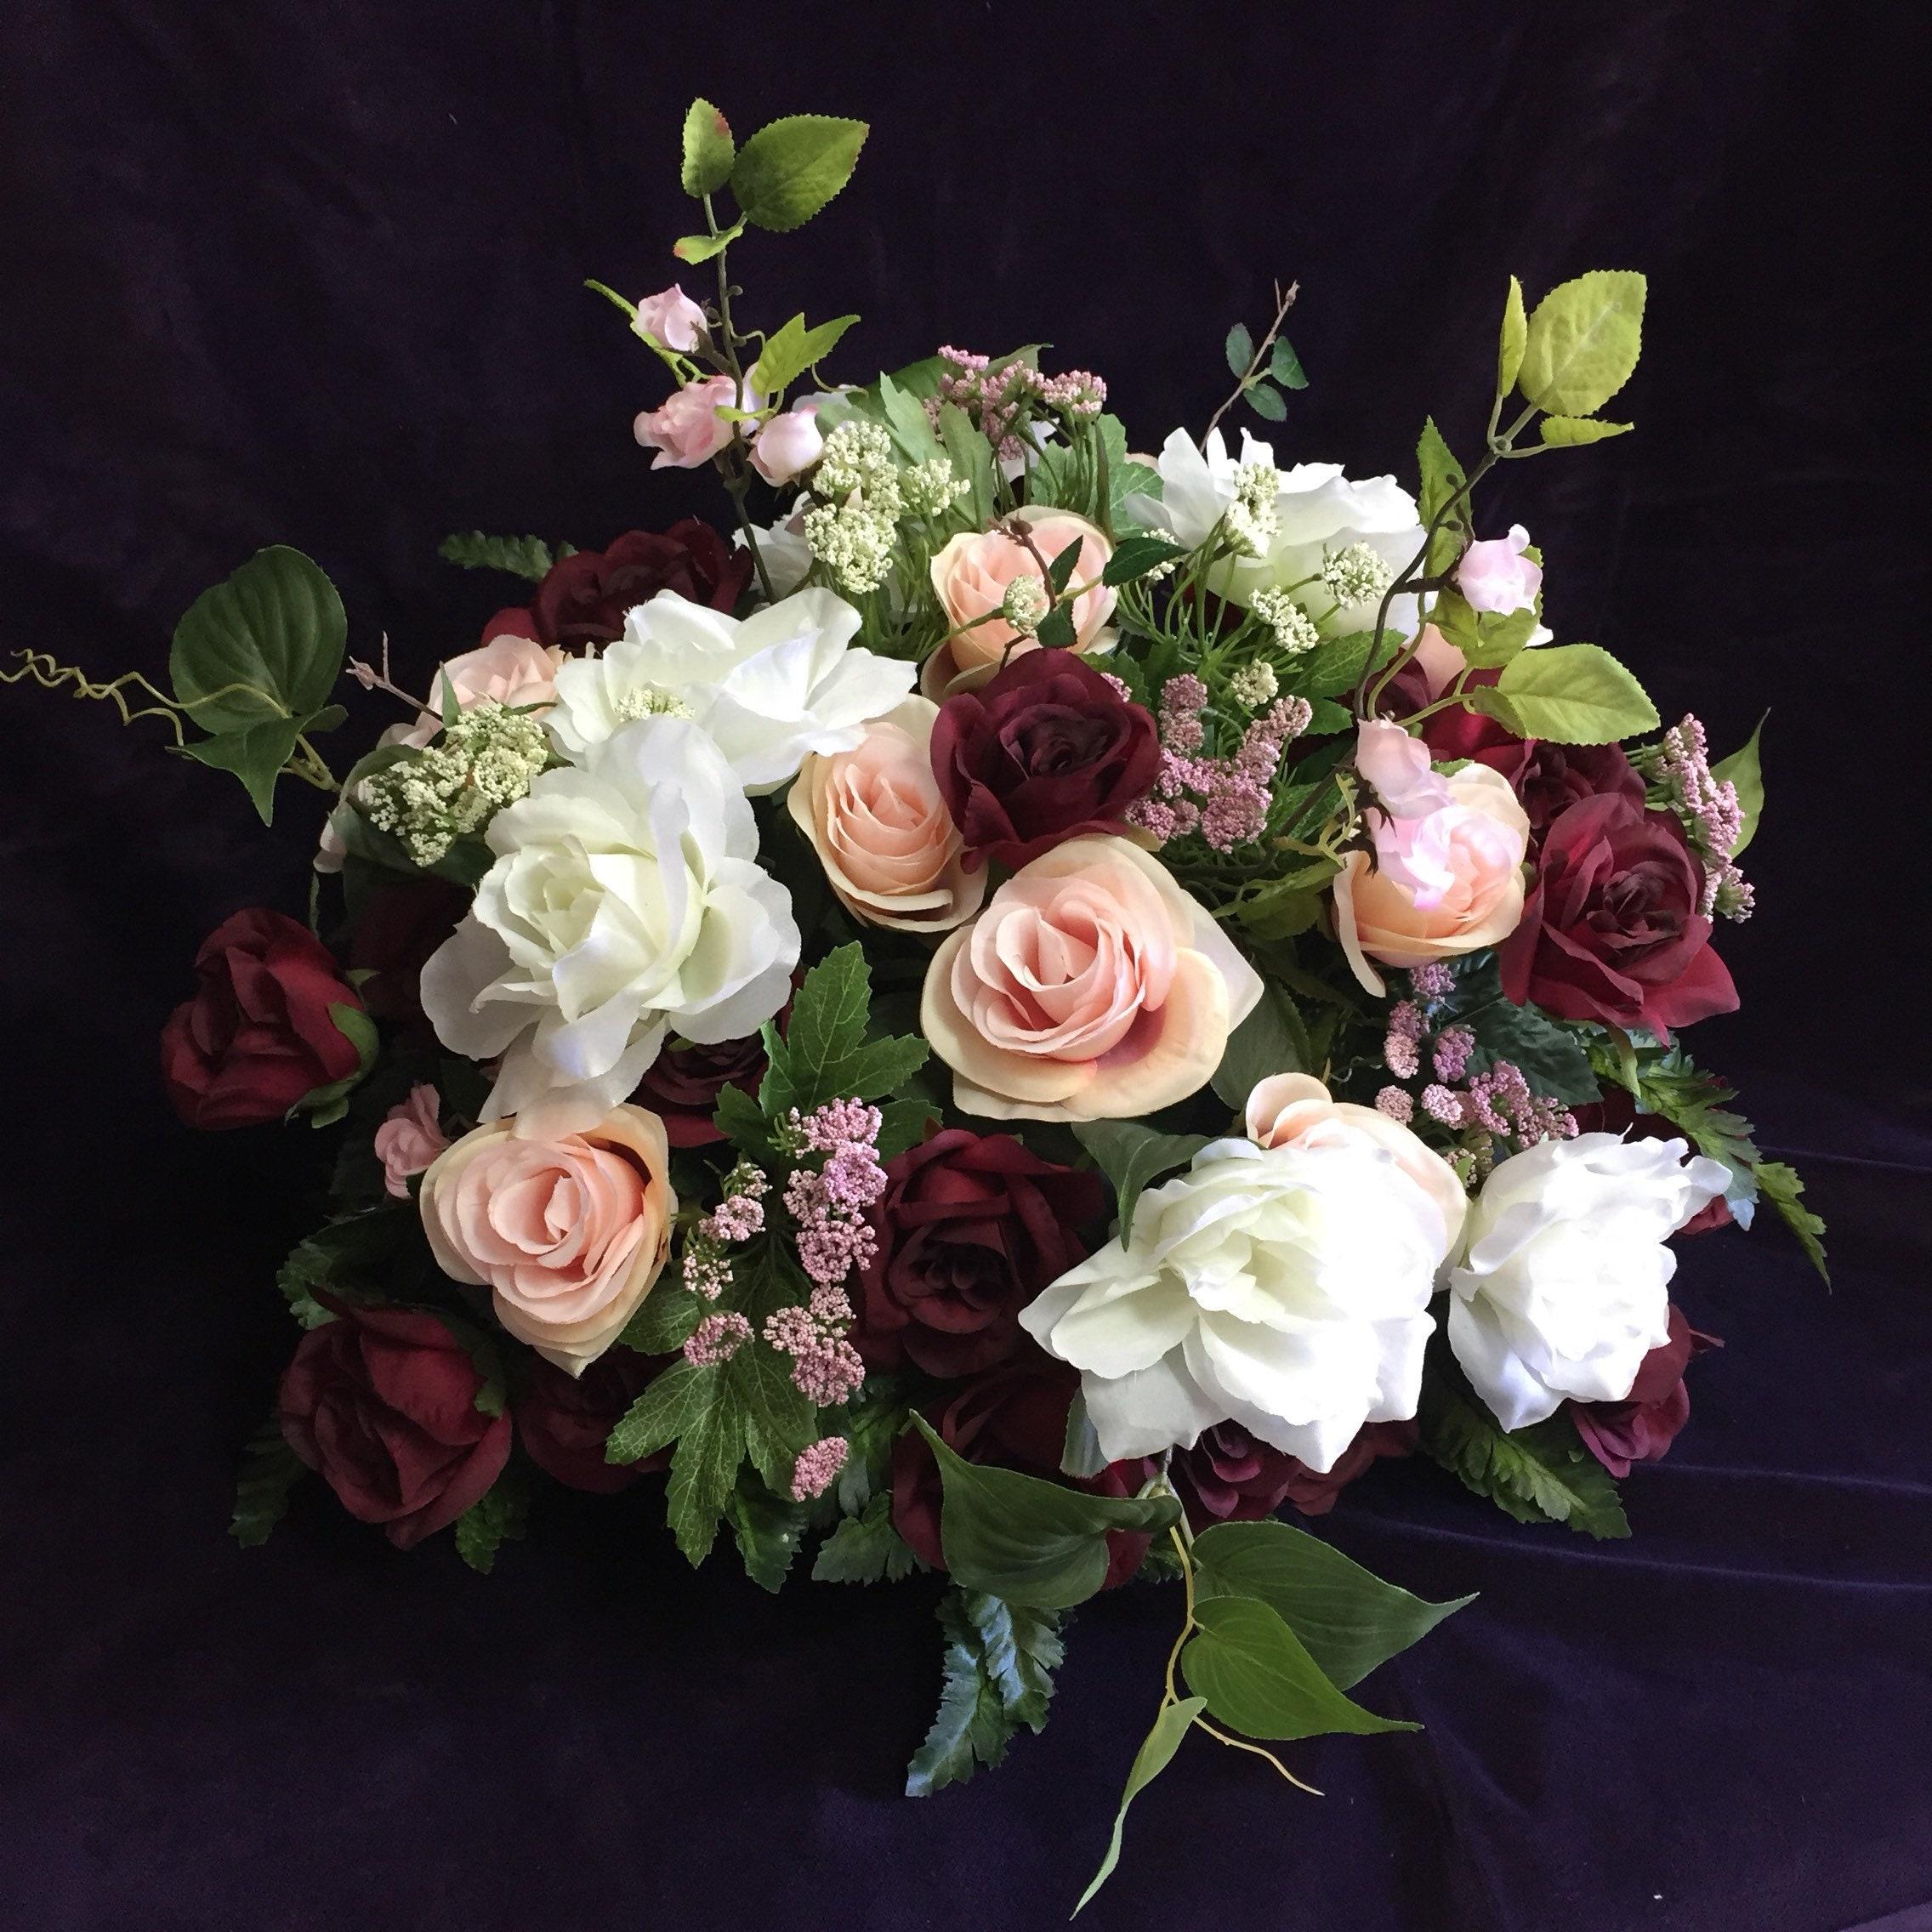 Pink Flower Centerpieces For Weddings: Bridal Table Centerpiece Burgundy Blush Pink Wedding